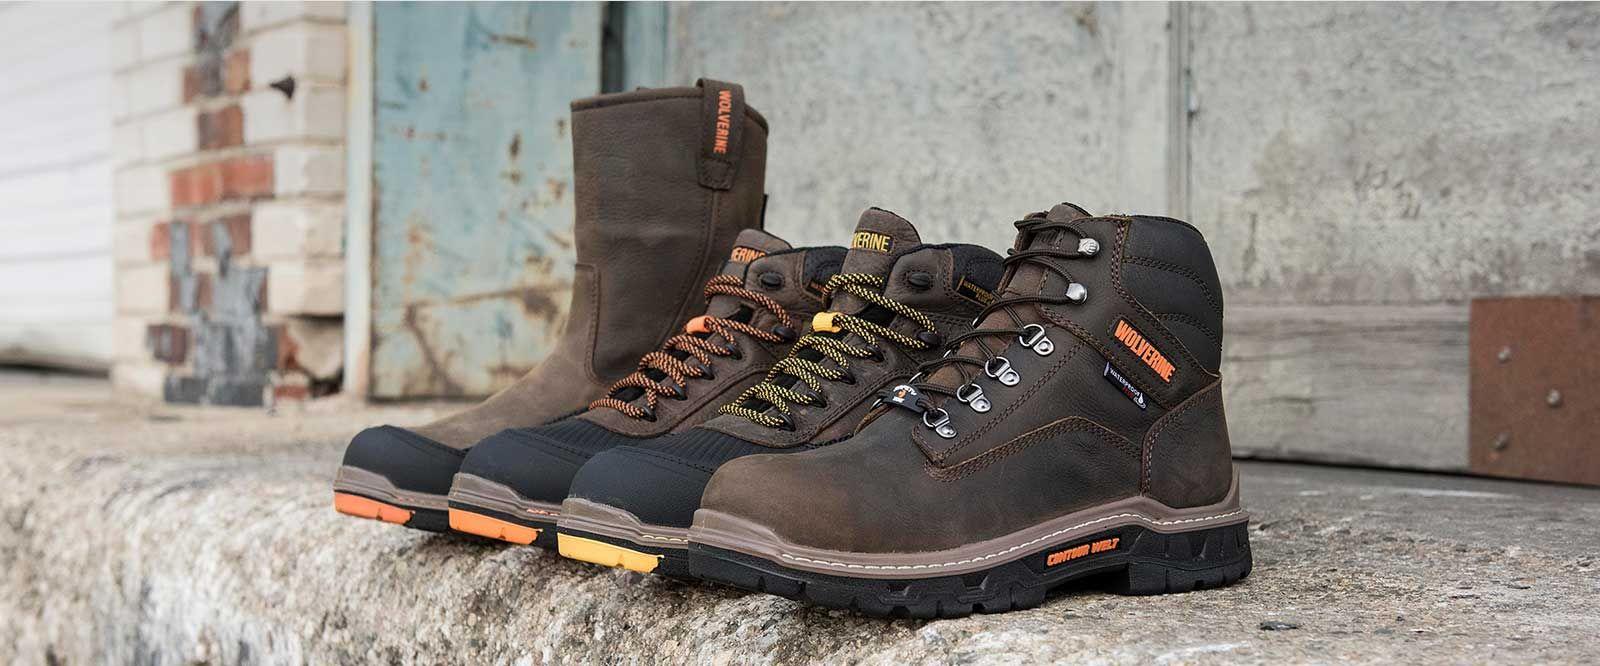 Best Lightweight Steel Toe Shoes for